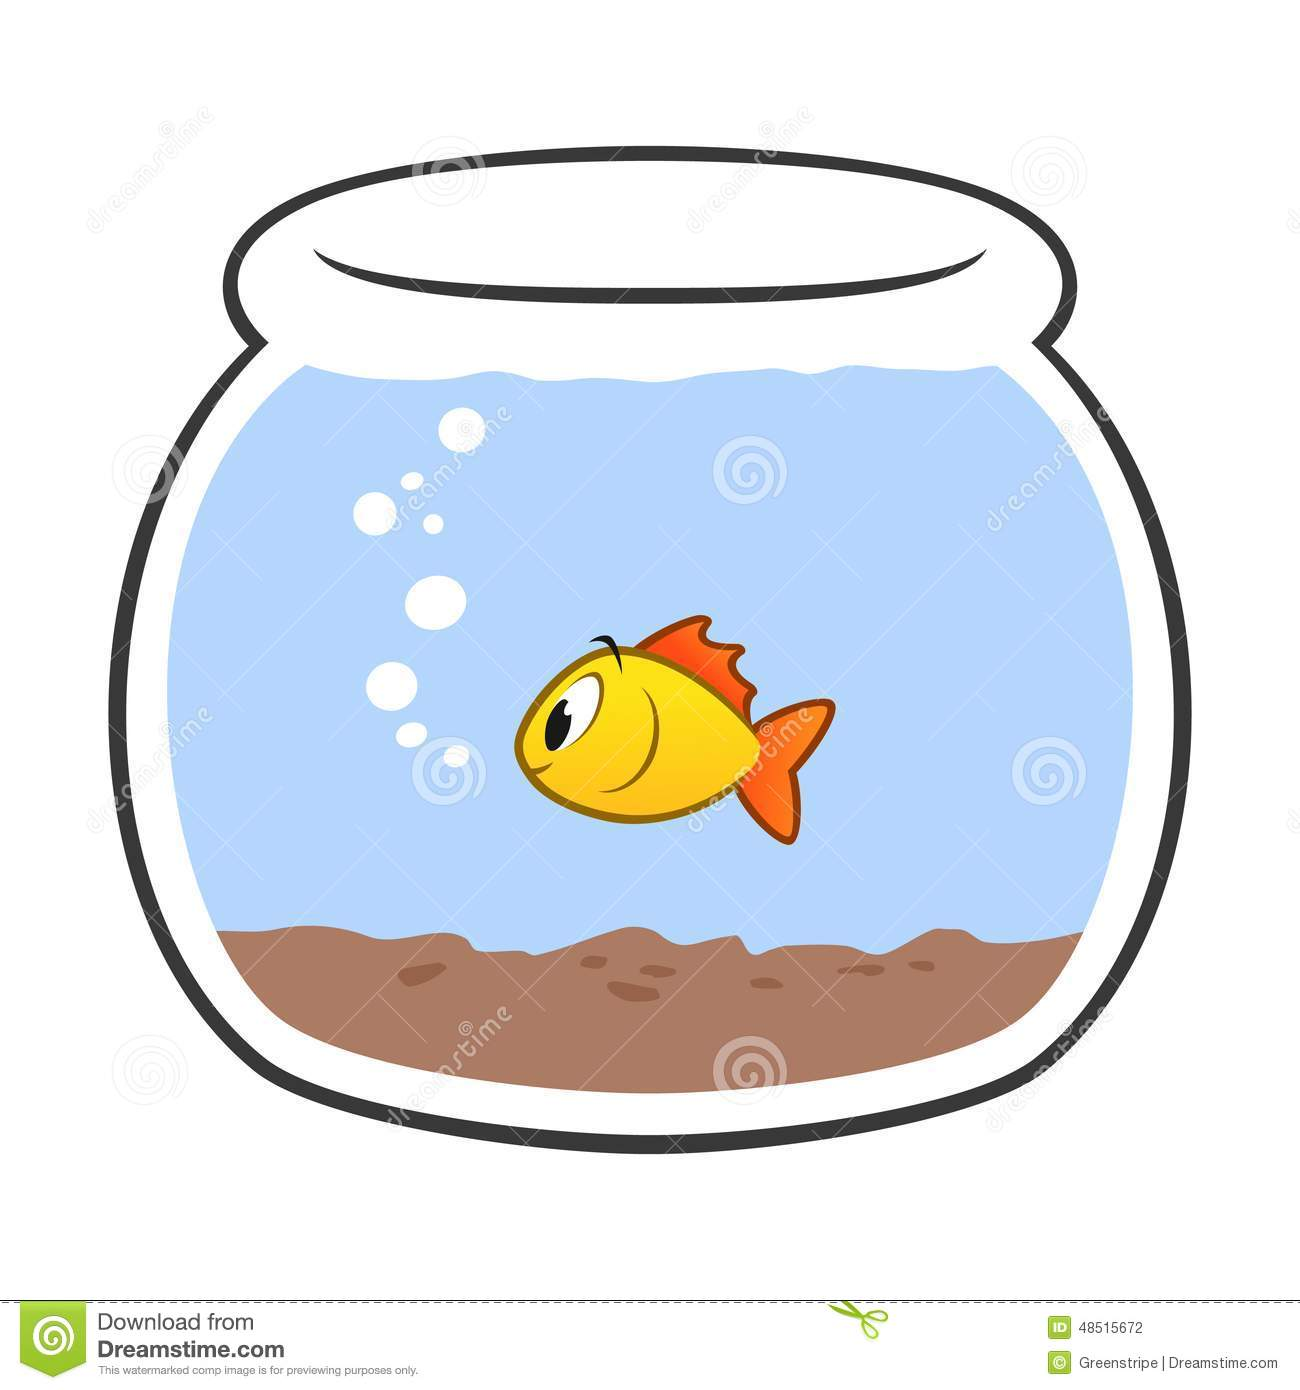 Fishbowl Clipart Goldfish Fis - Fish Bowl Clipart